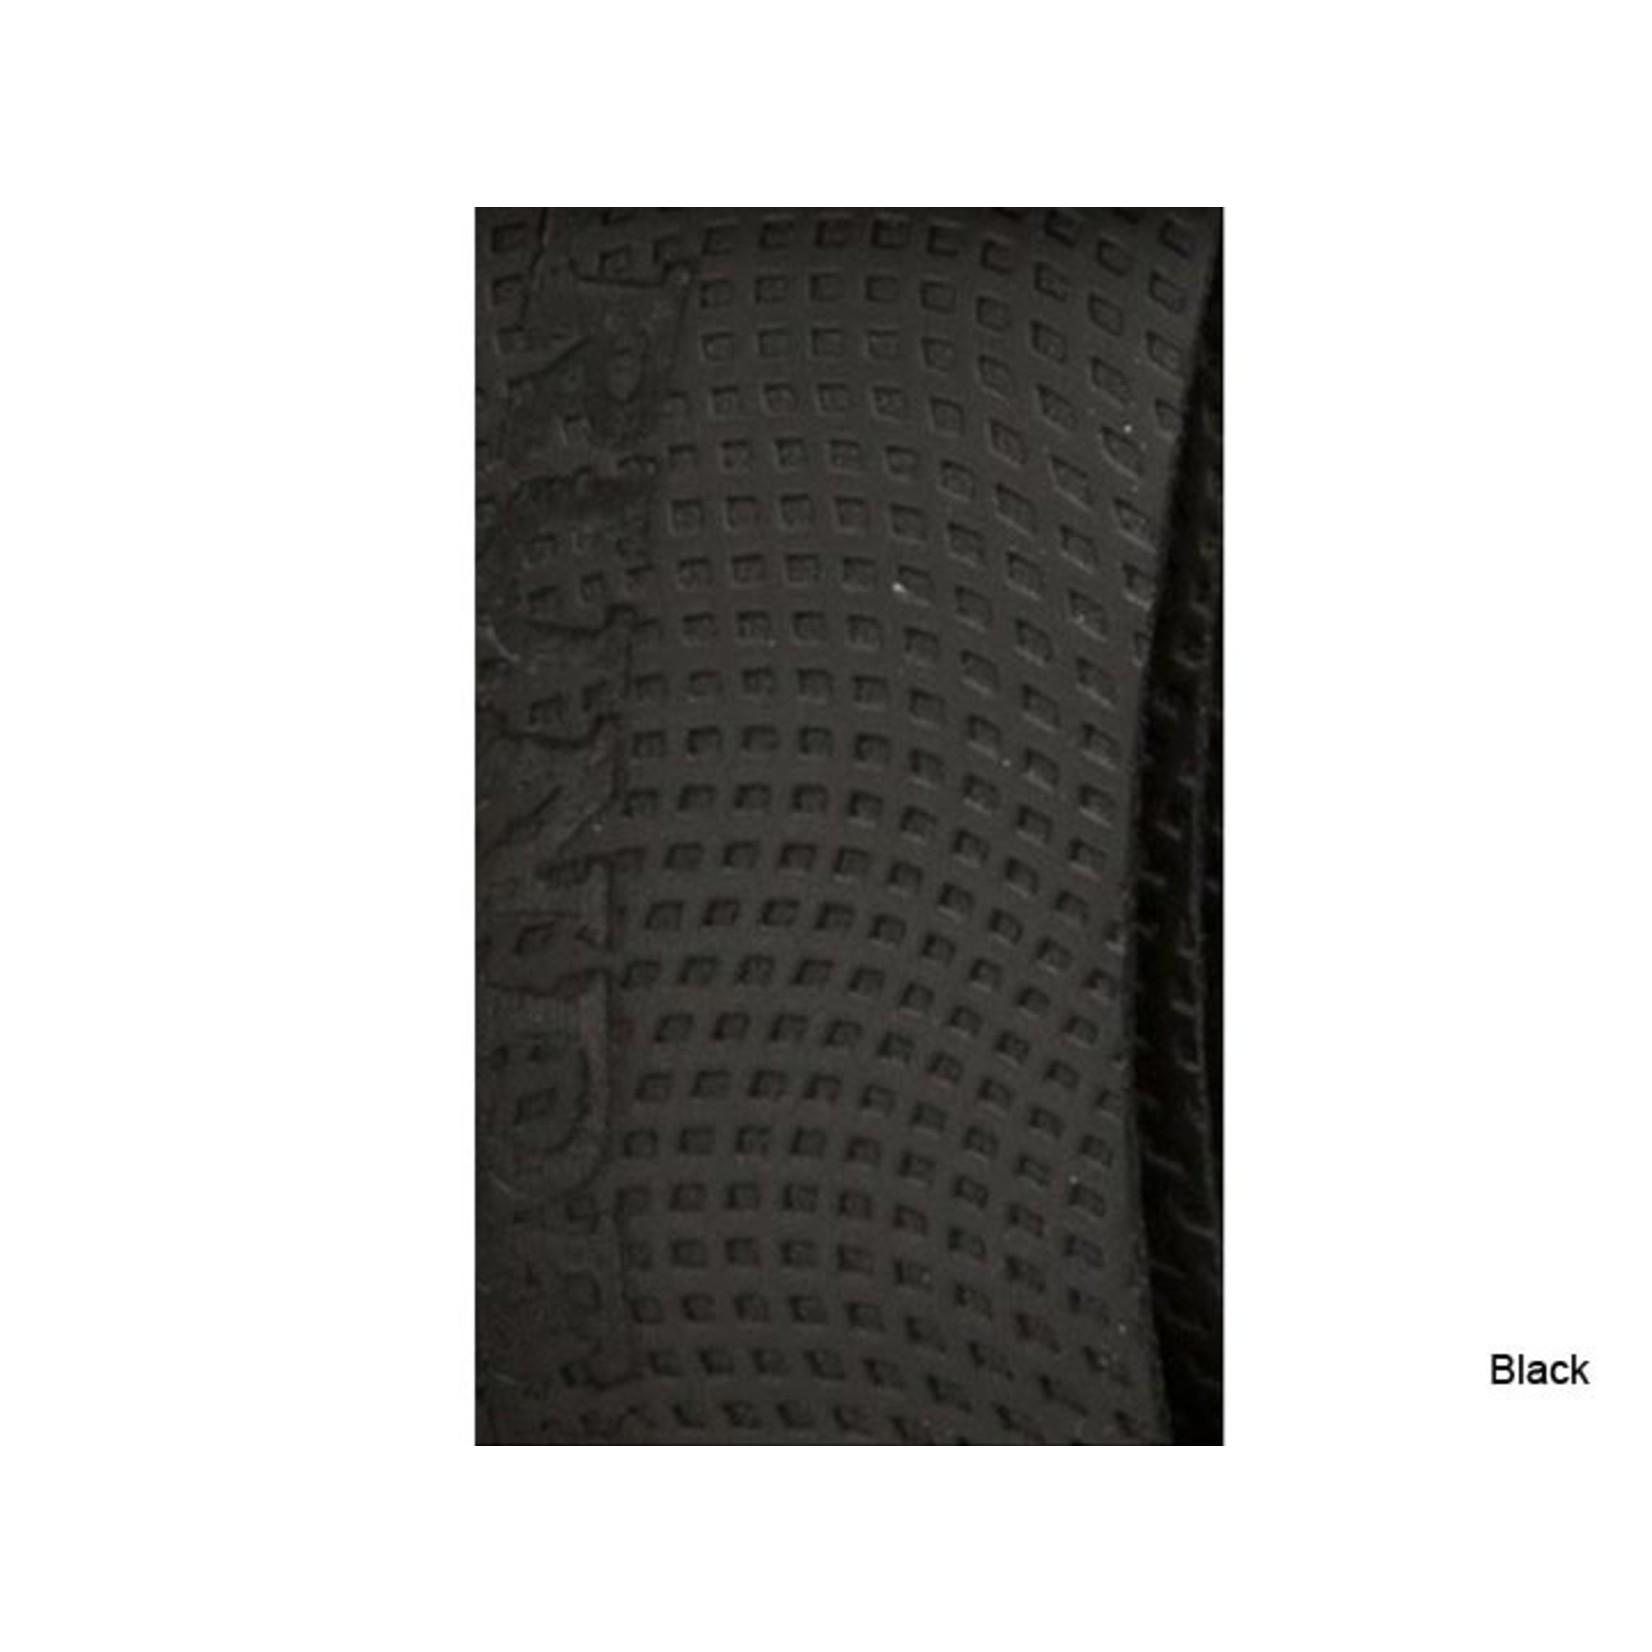 Arundel Arundel, Bar Tape Gecko Grip